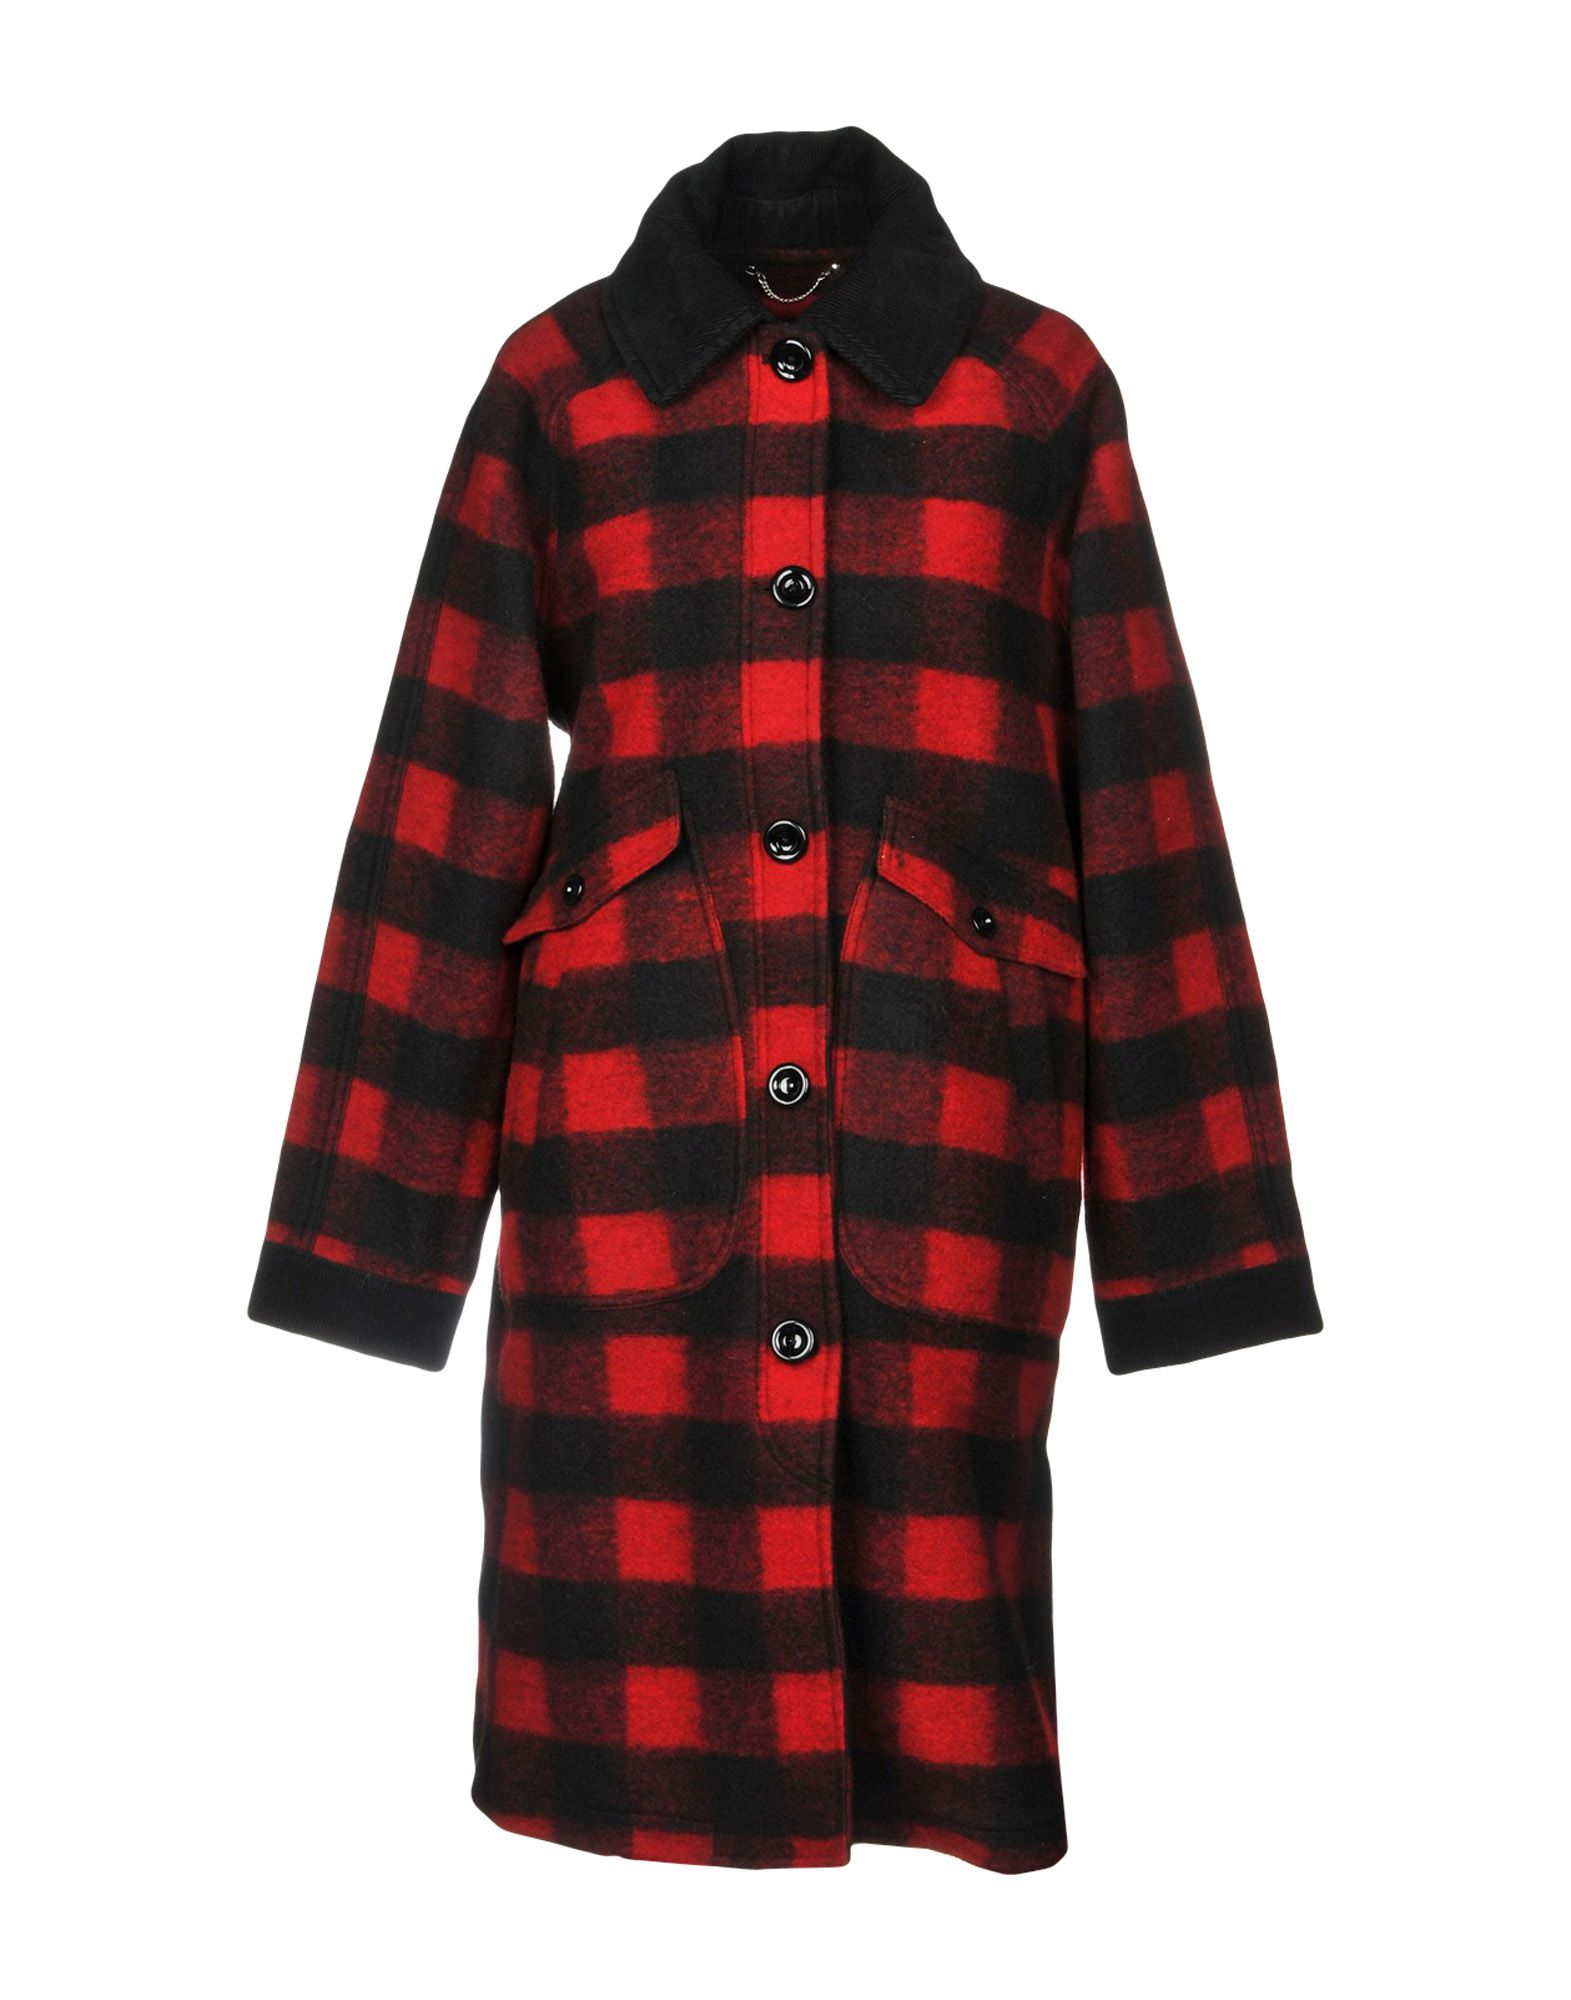 Coat in Red